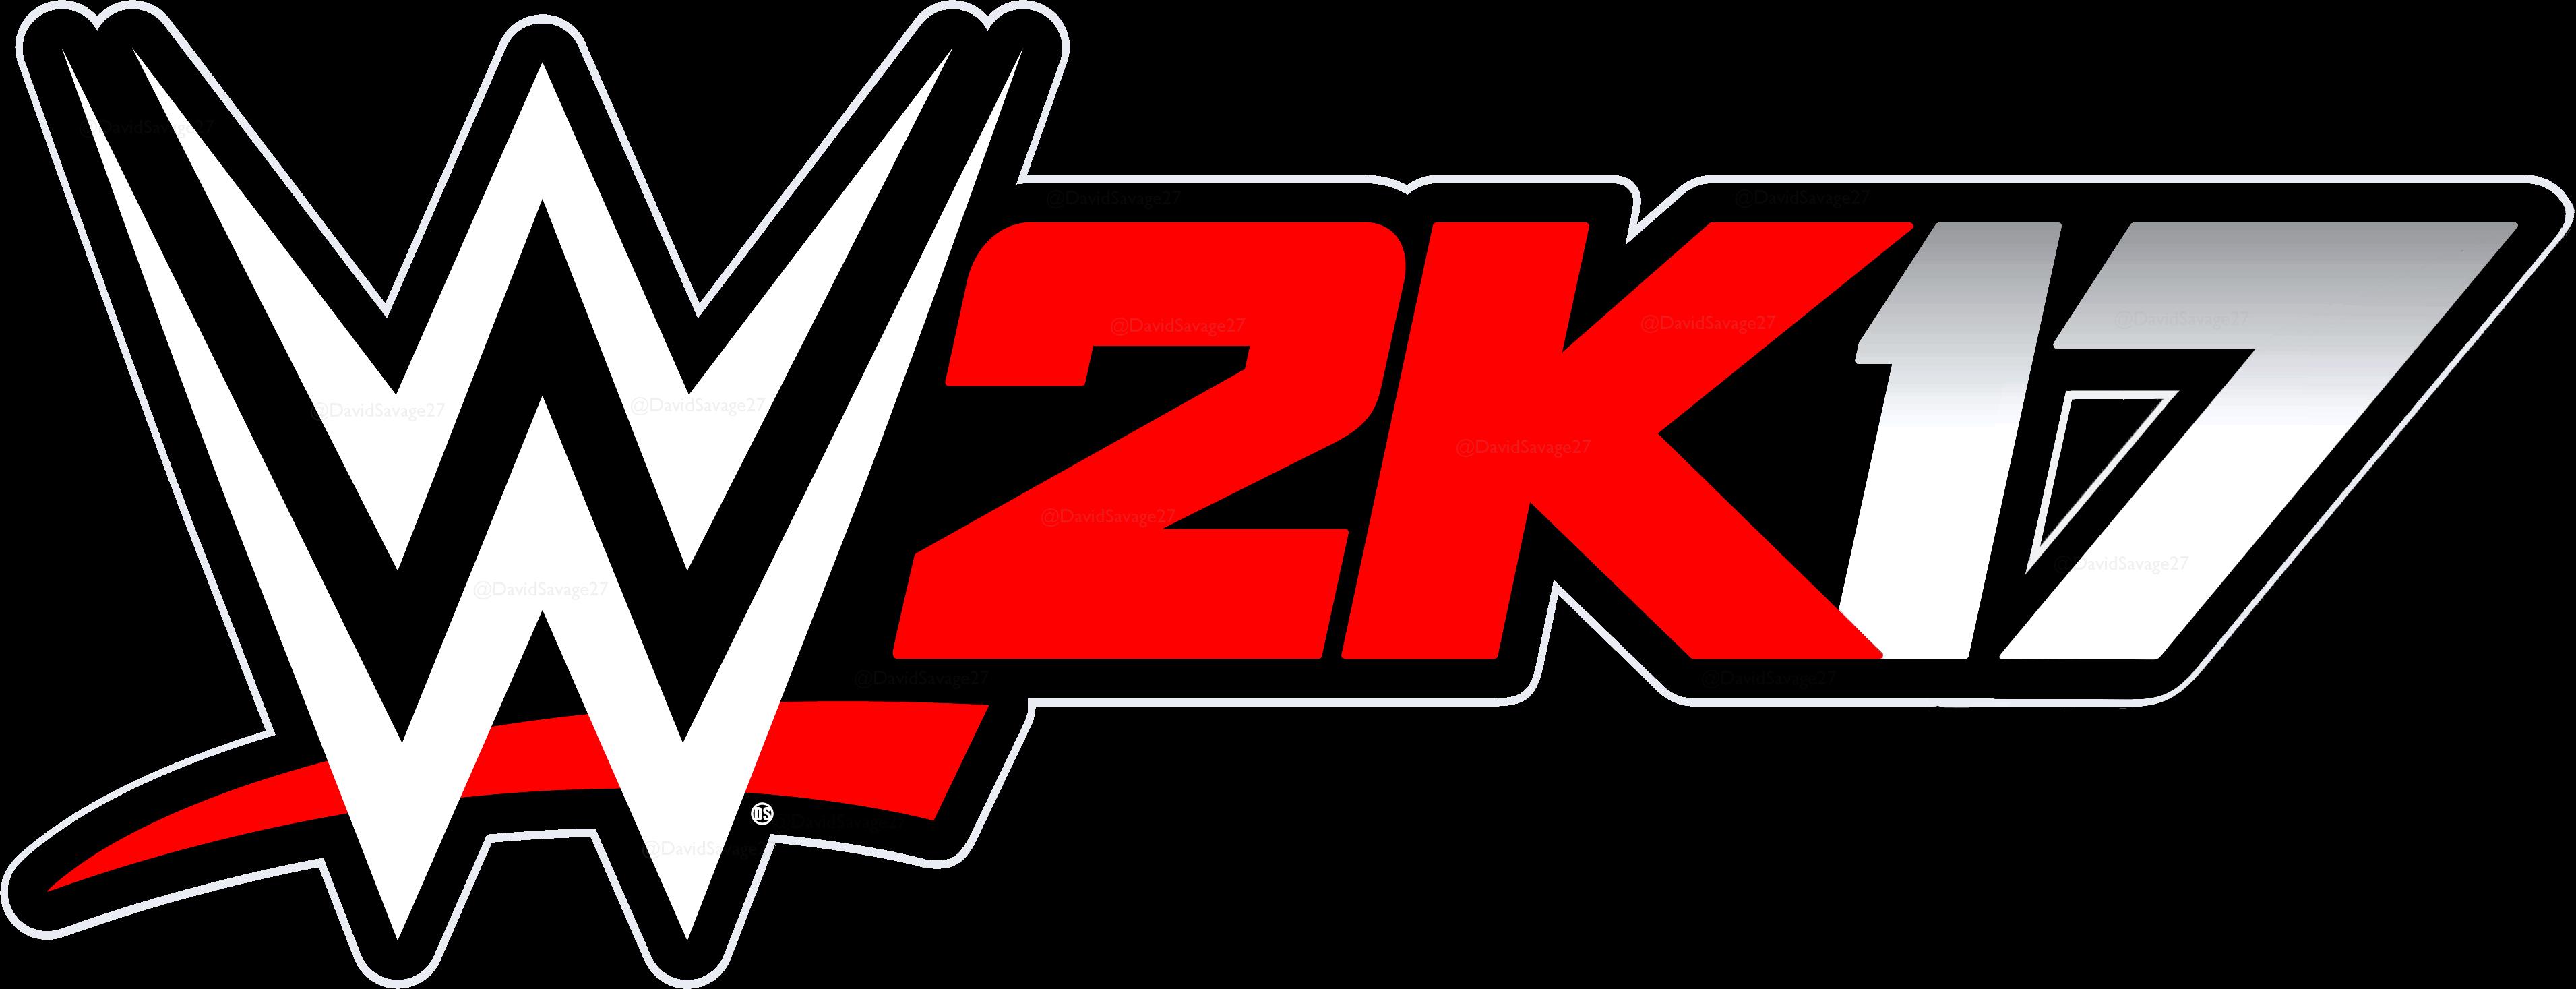 WWE 2K17 Unofficial logo